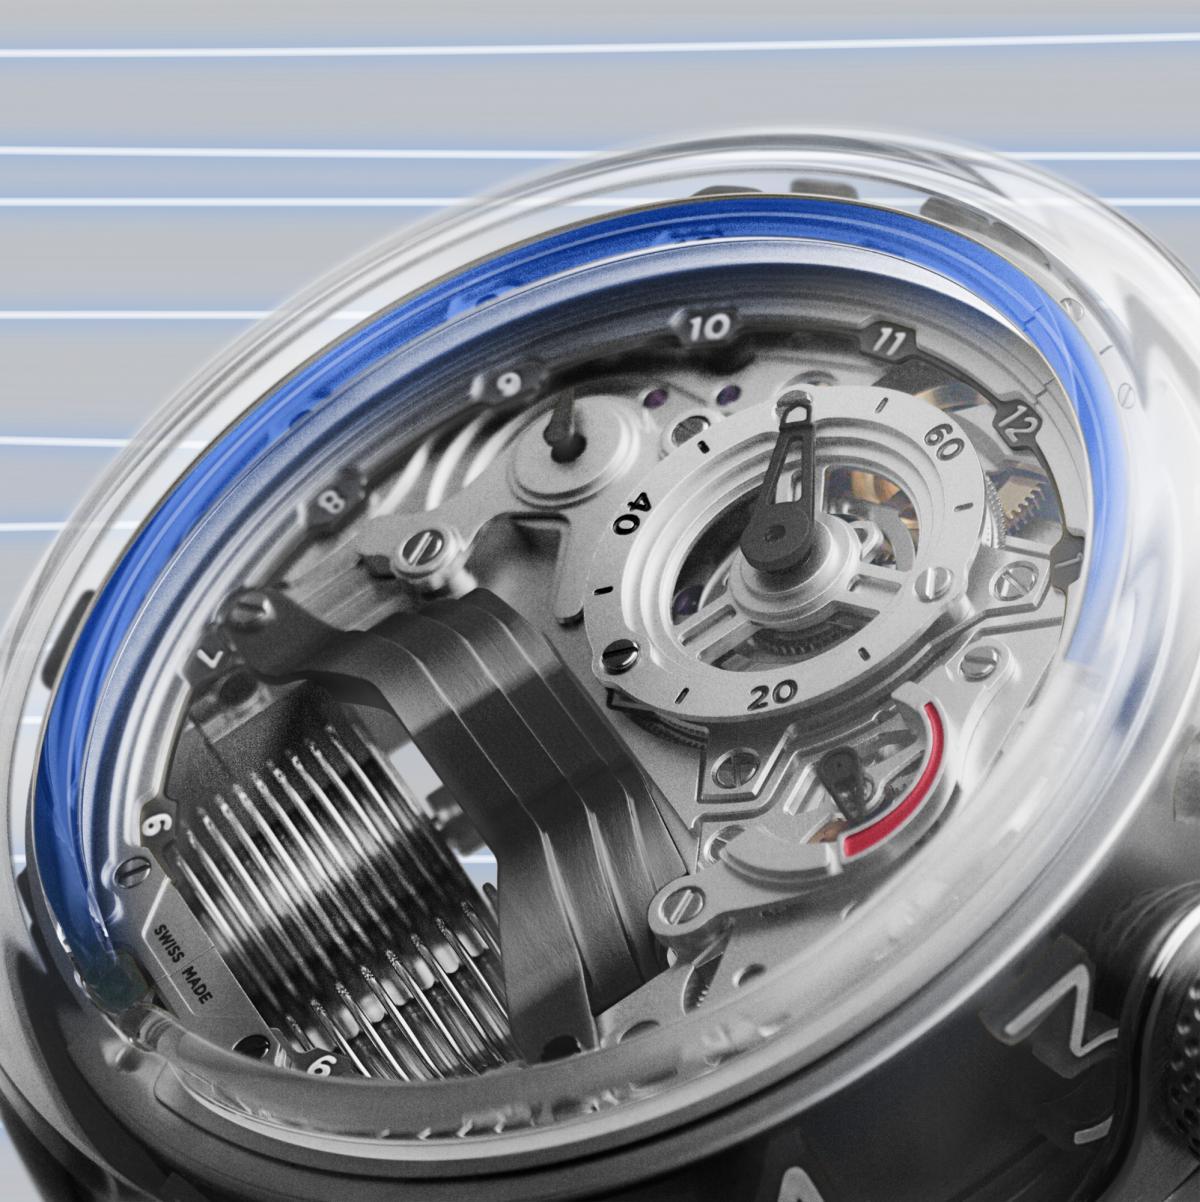 hyt-h5-bluefluid-2000x2000px